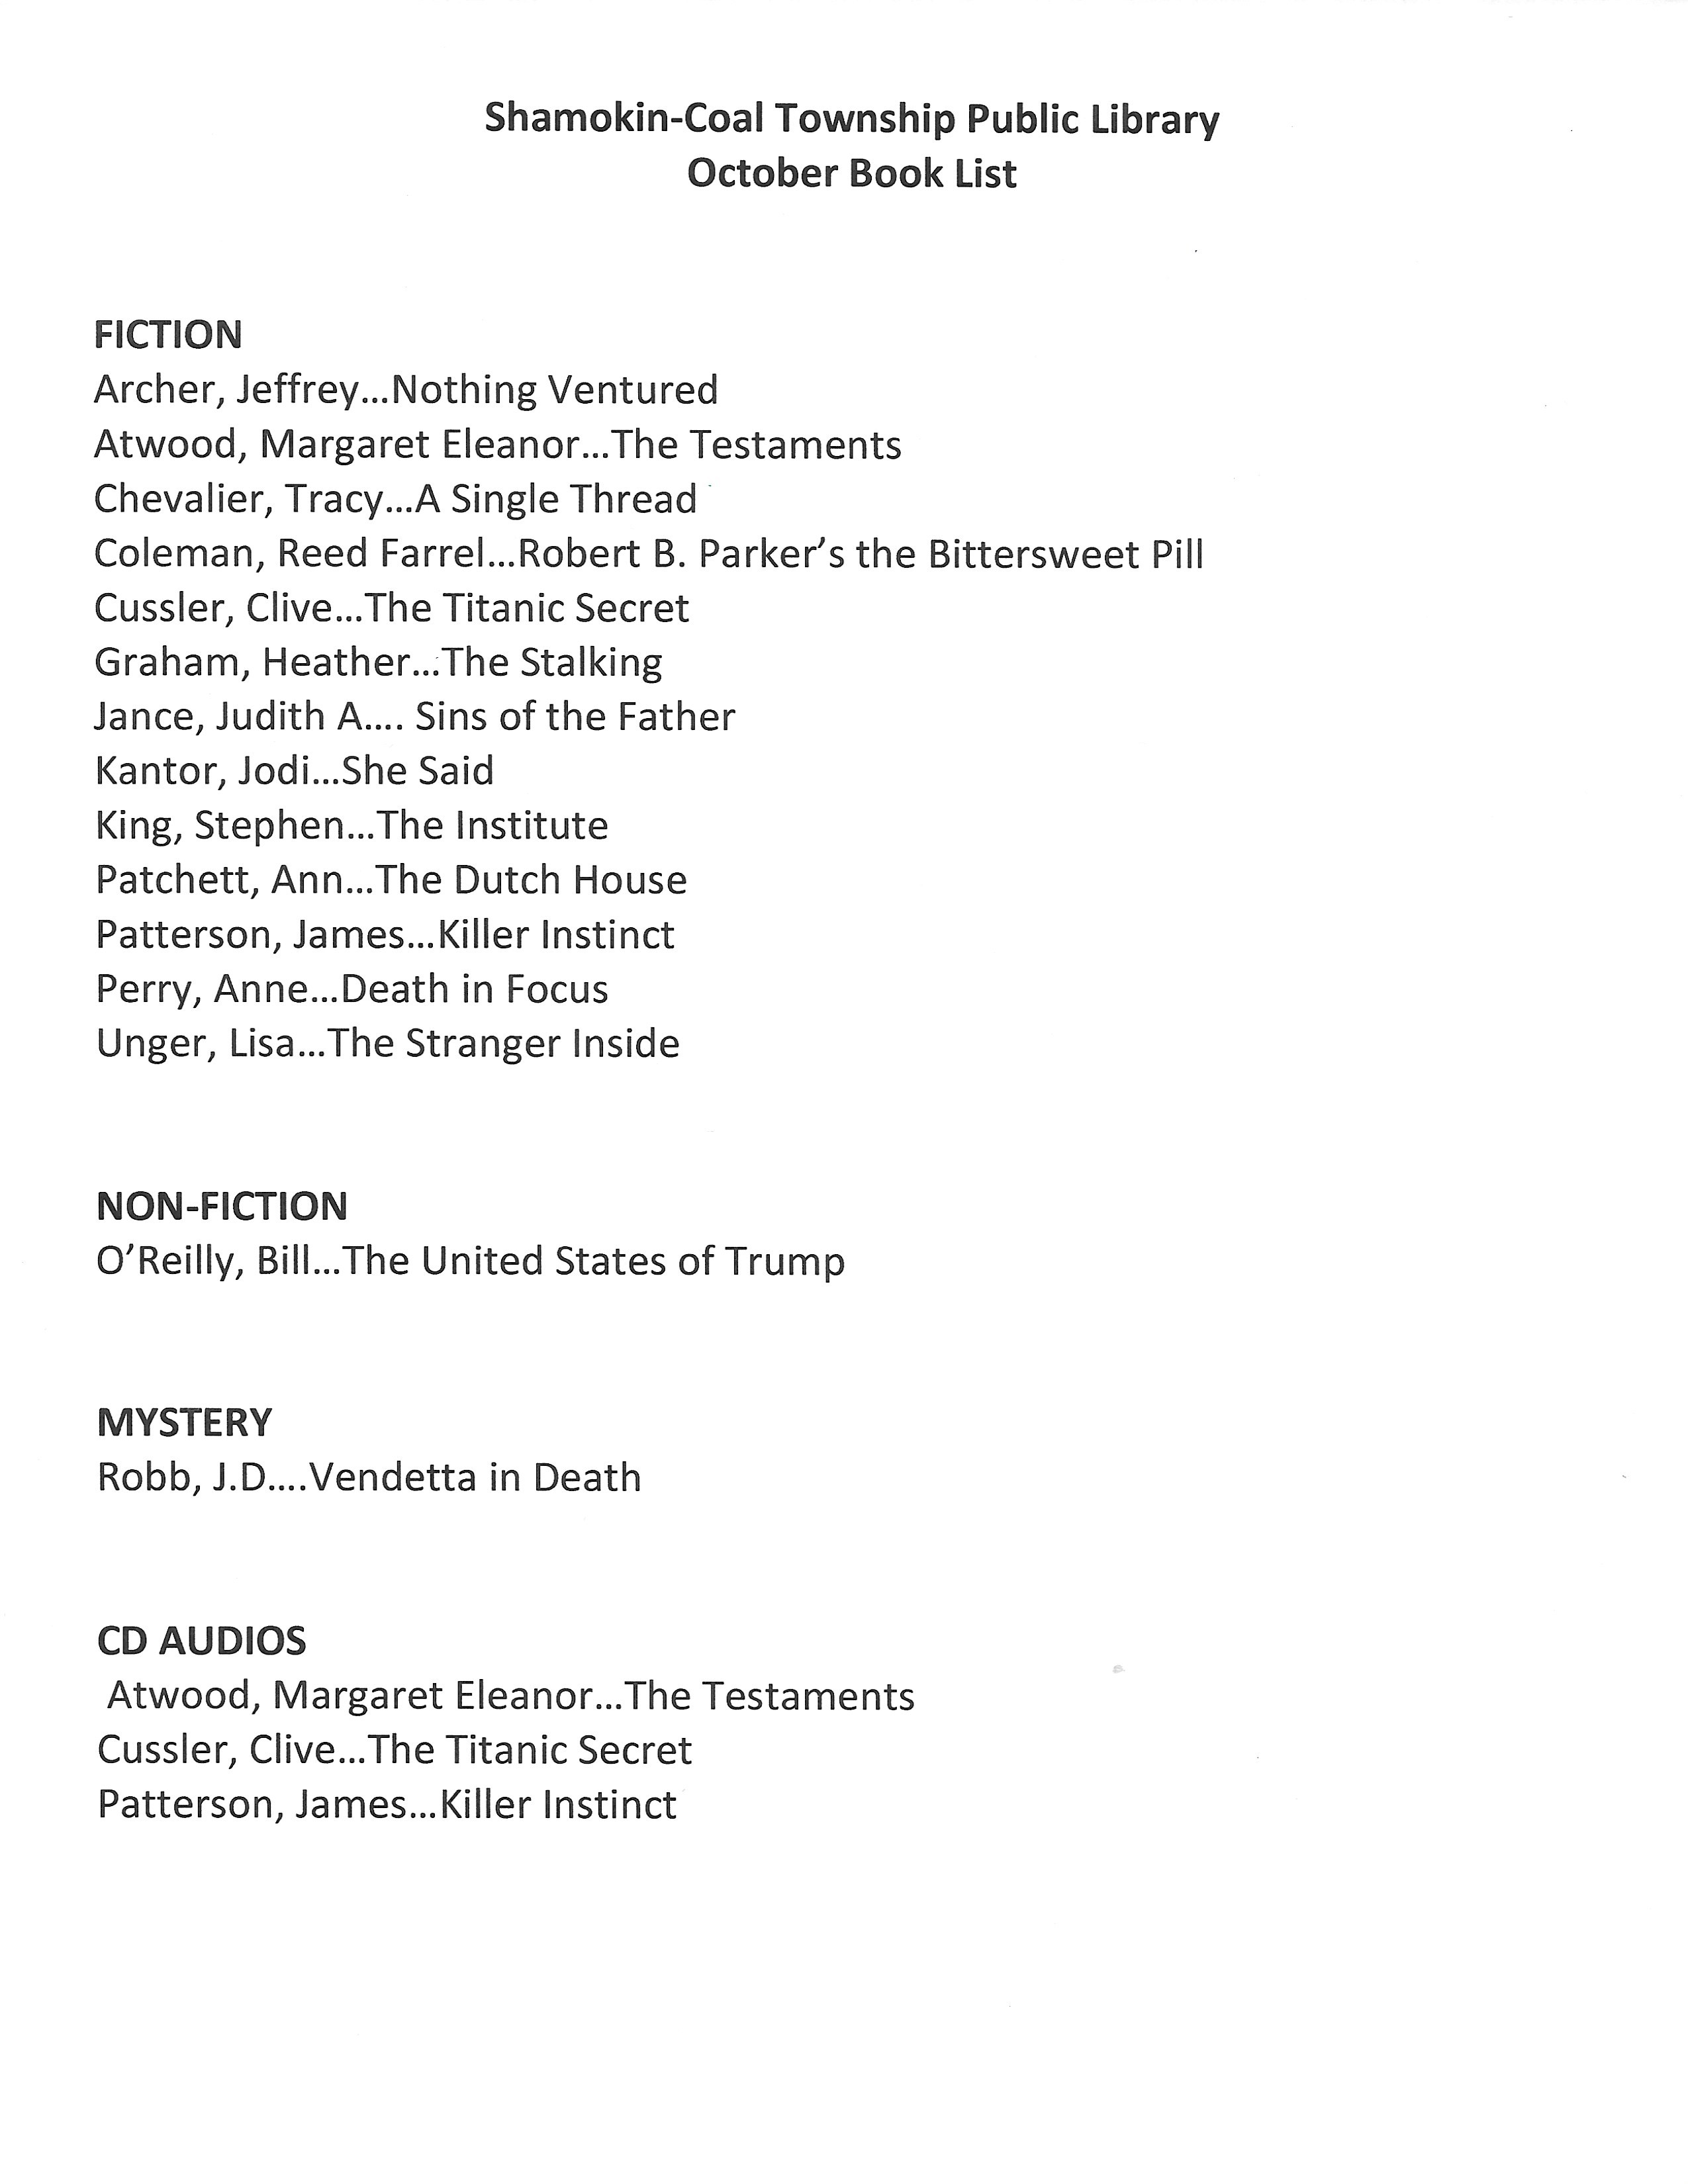 October 2019 booklist